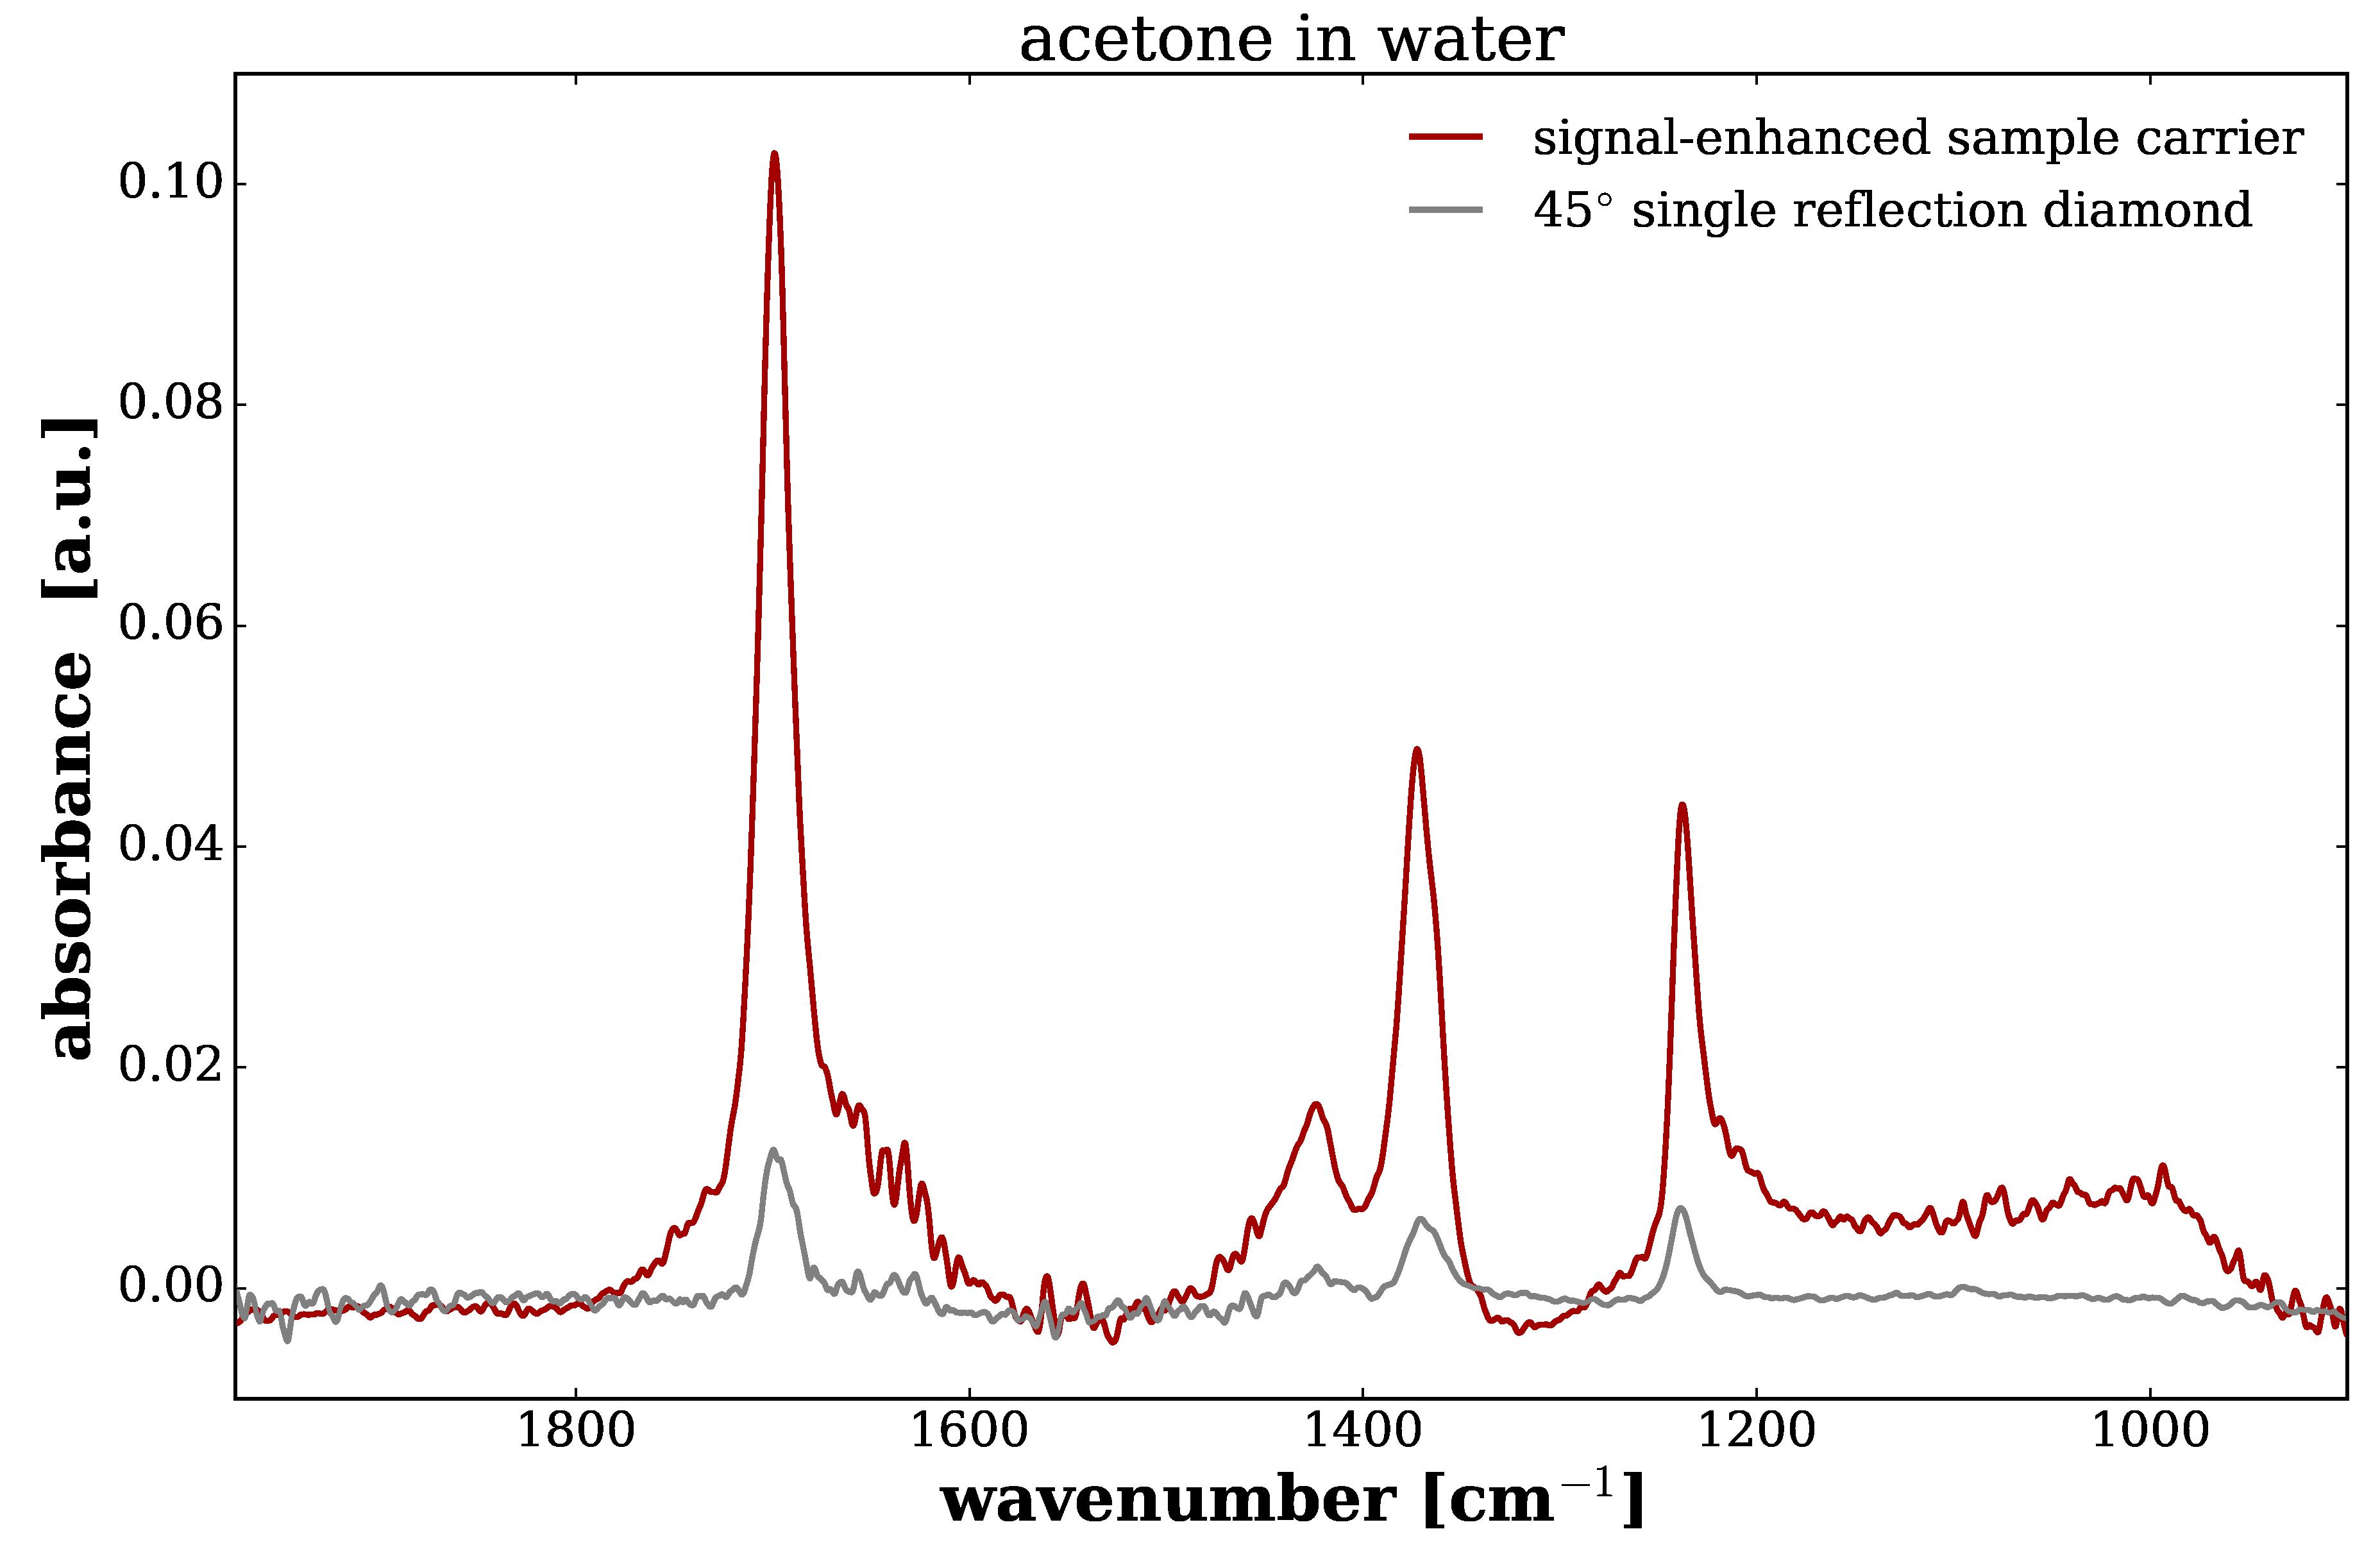 ATR Infrared Spectroscopy FTIR crystal sample carrier spectra irubis acetone water